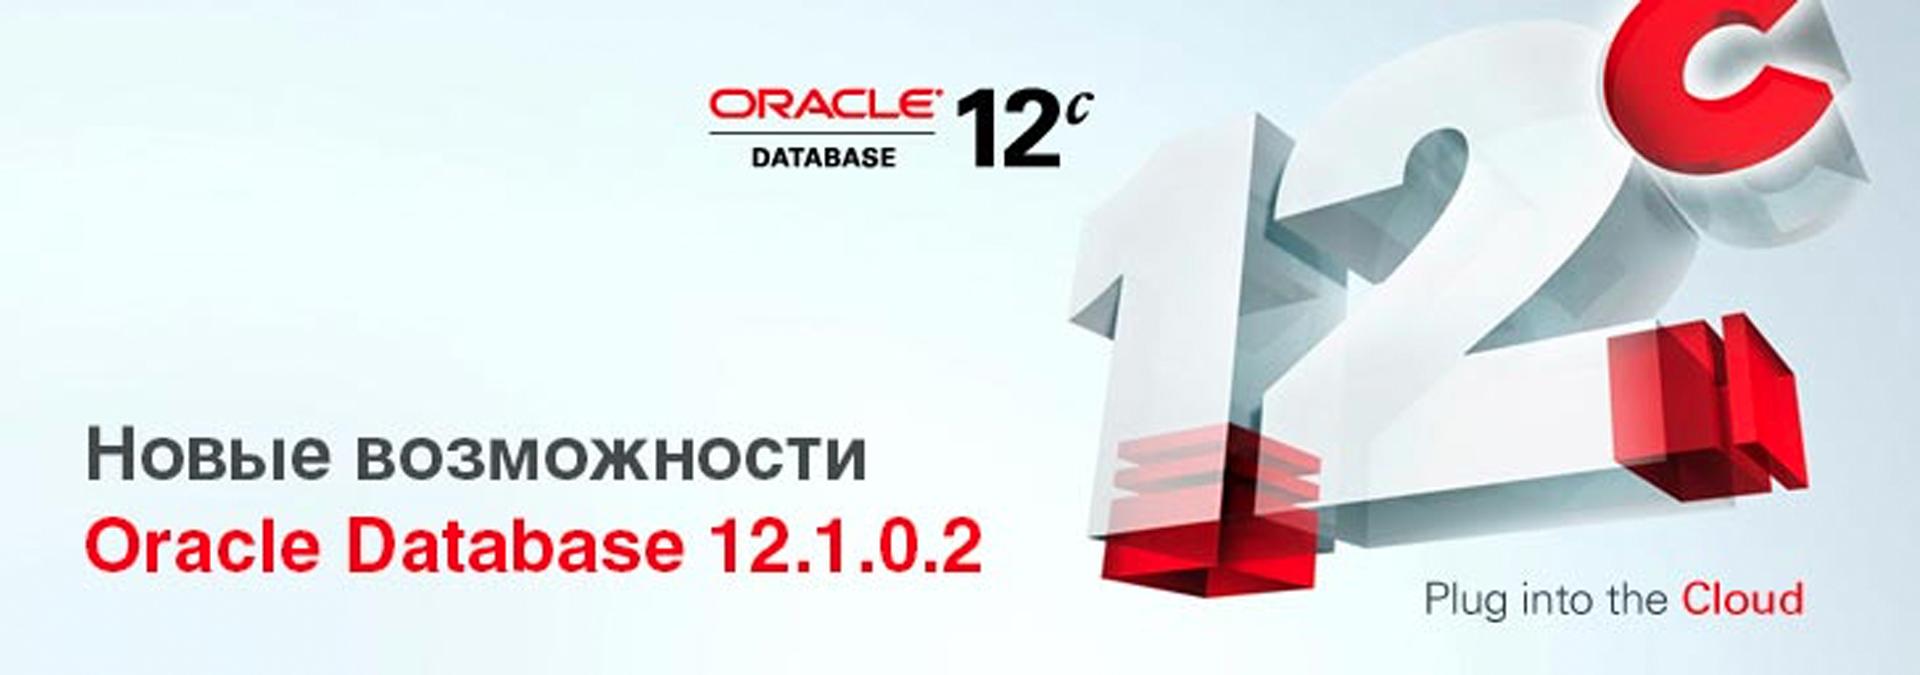 Регистрация на веб-семинар Oracle «Новые возможности Oracle Database 12.1.0.2»